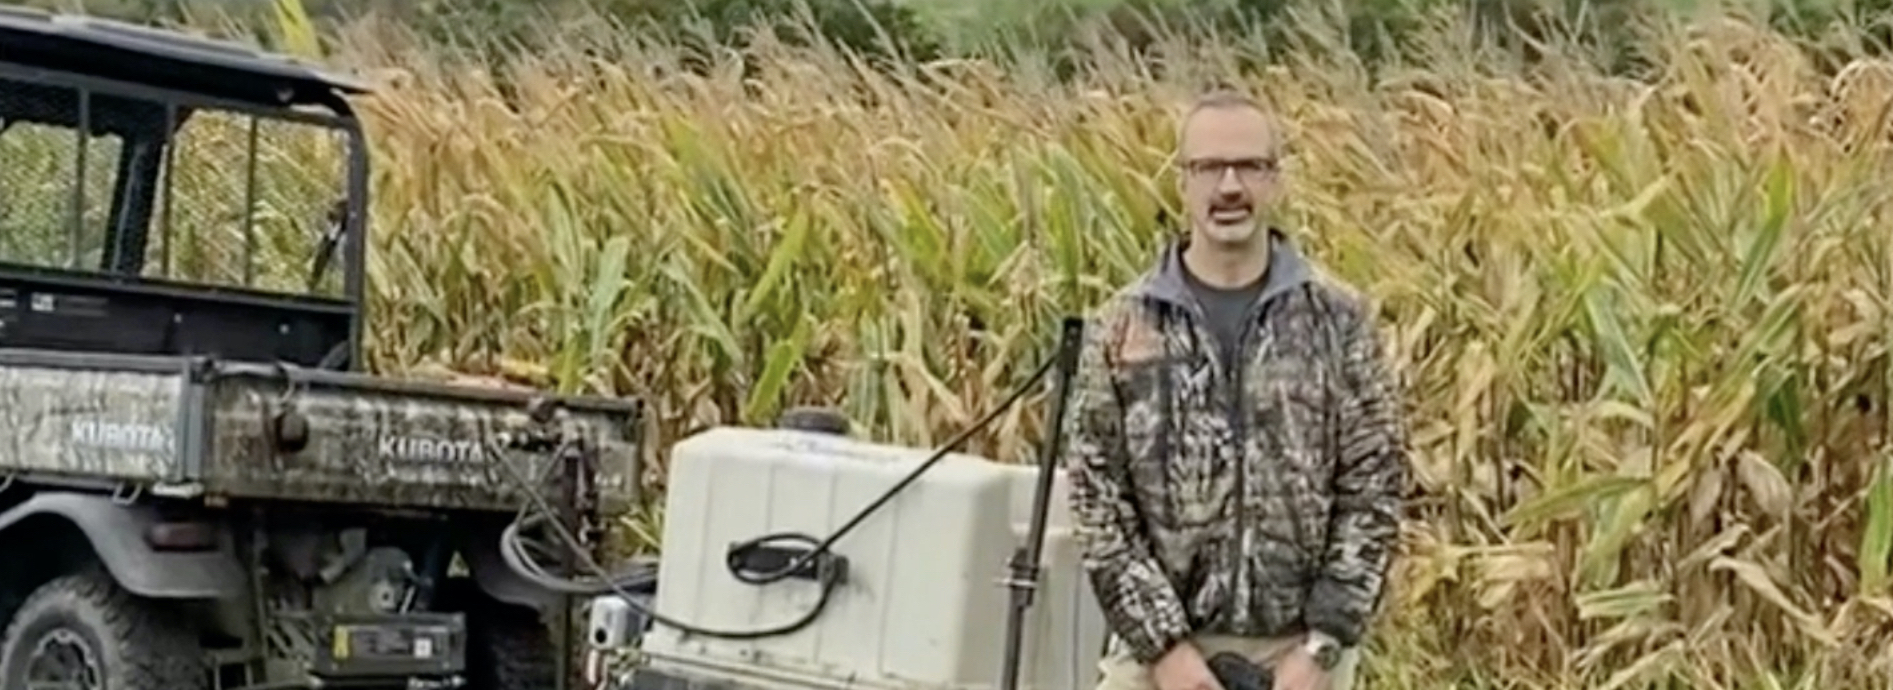 Iowa corn farmer Jim Bower describes how Plantskydd saved his farm from deer